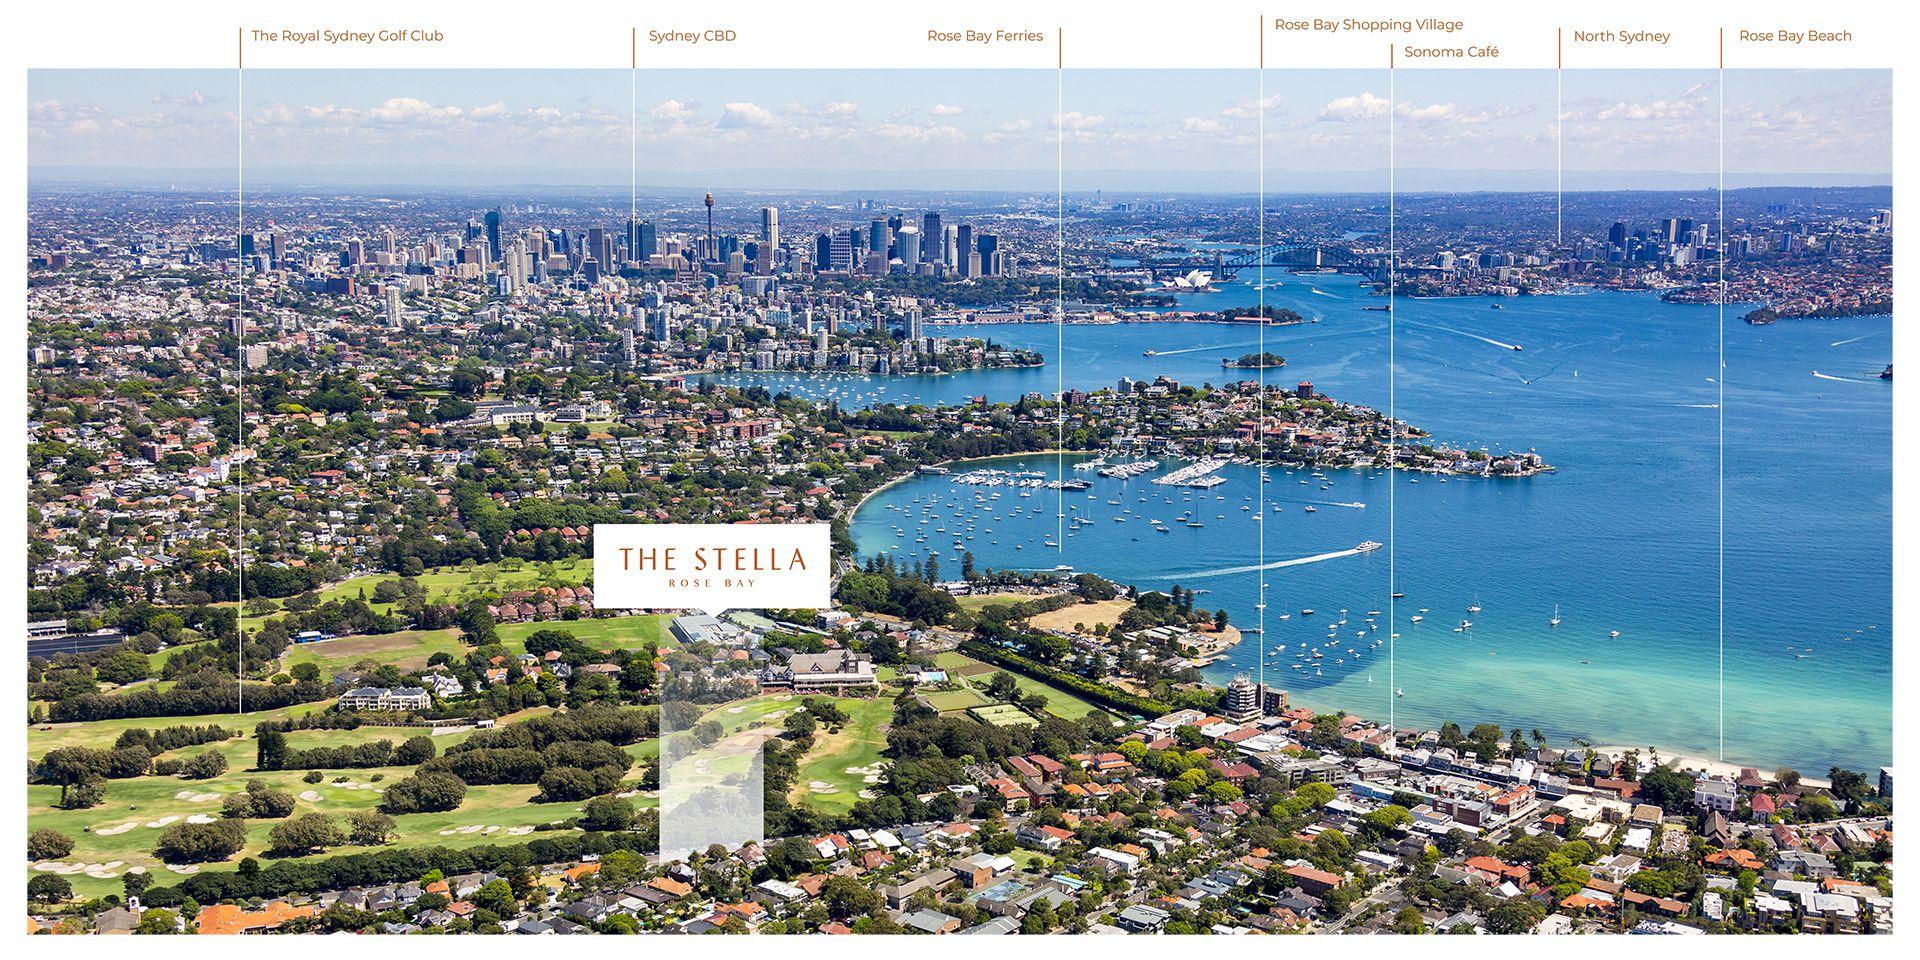 58-60 Newcastle Street, Rose Bay, NSW 2029, Image 0